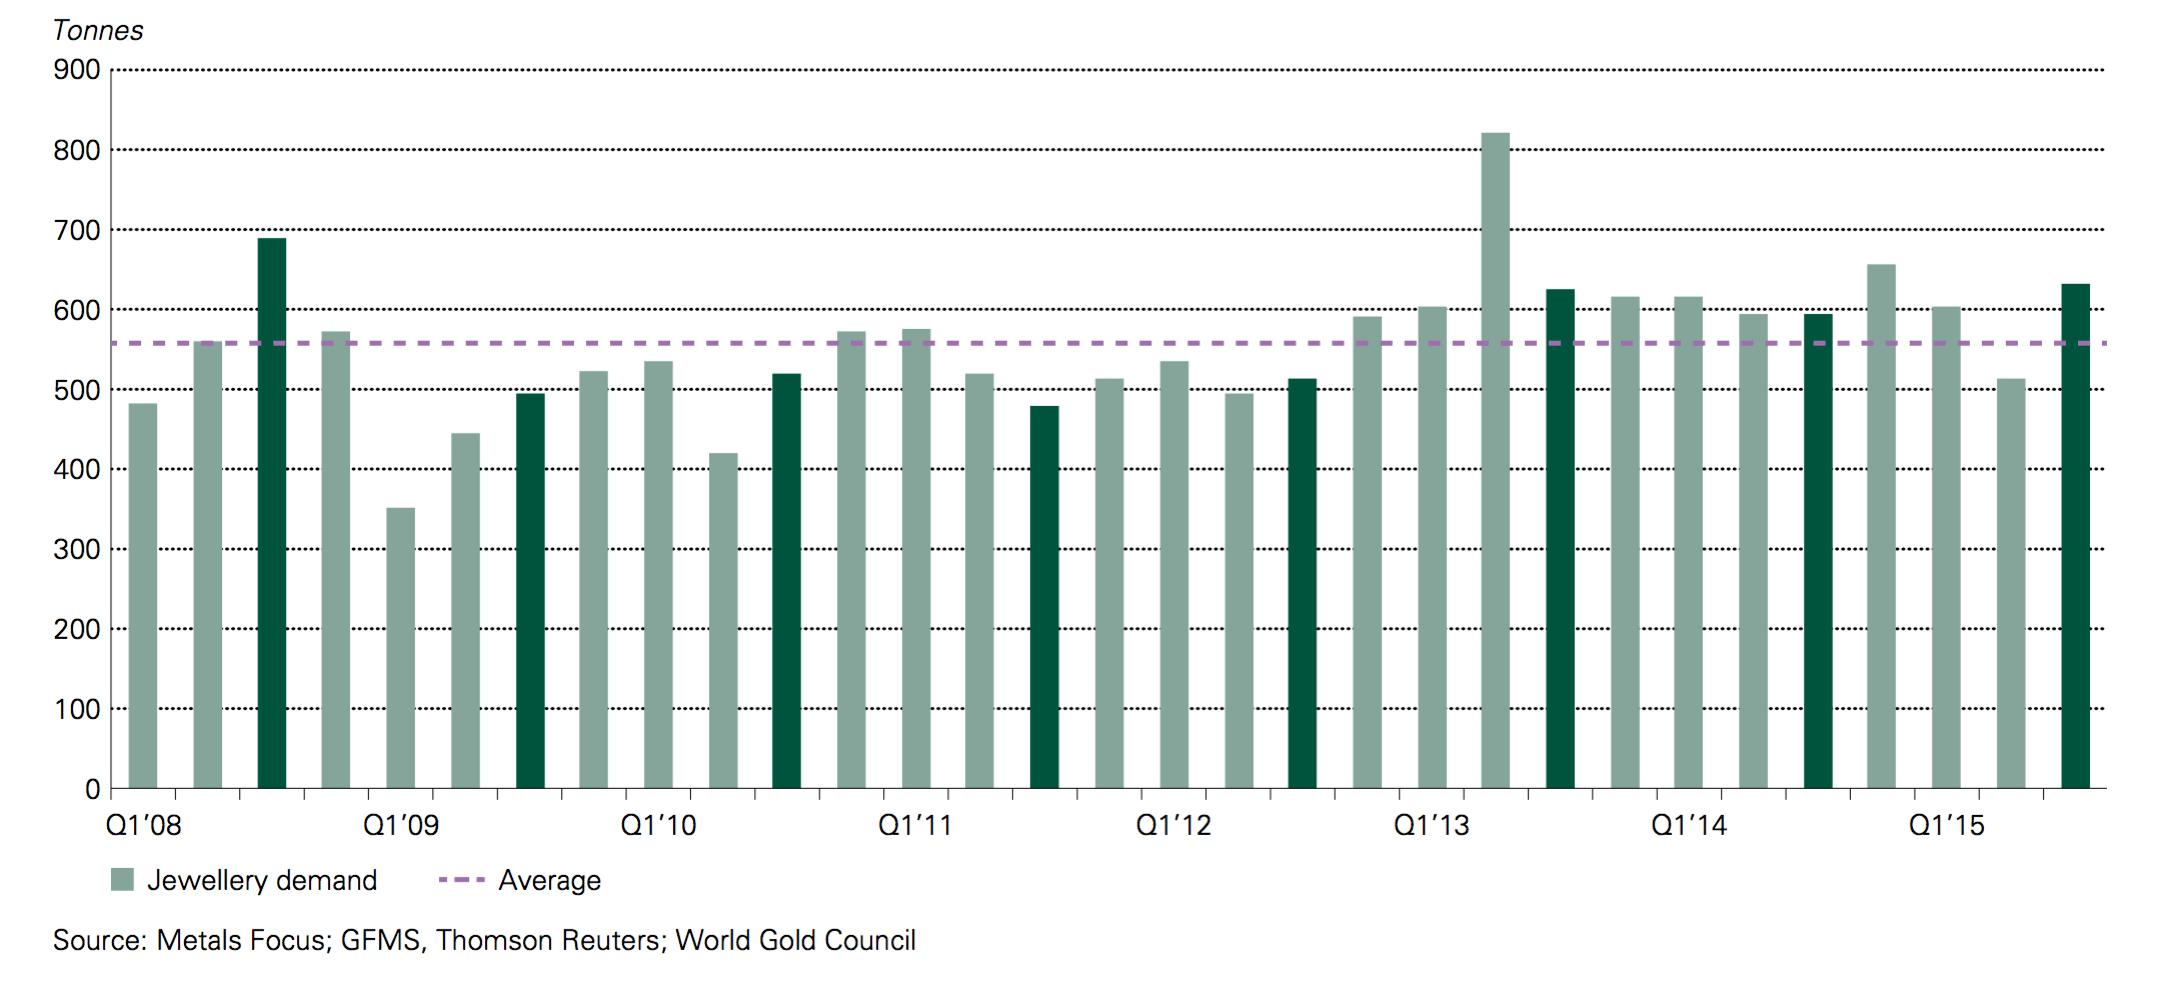 Historique demande or joaillerie 2008 2015